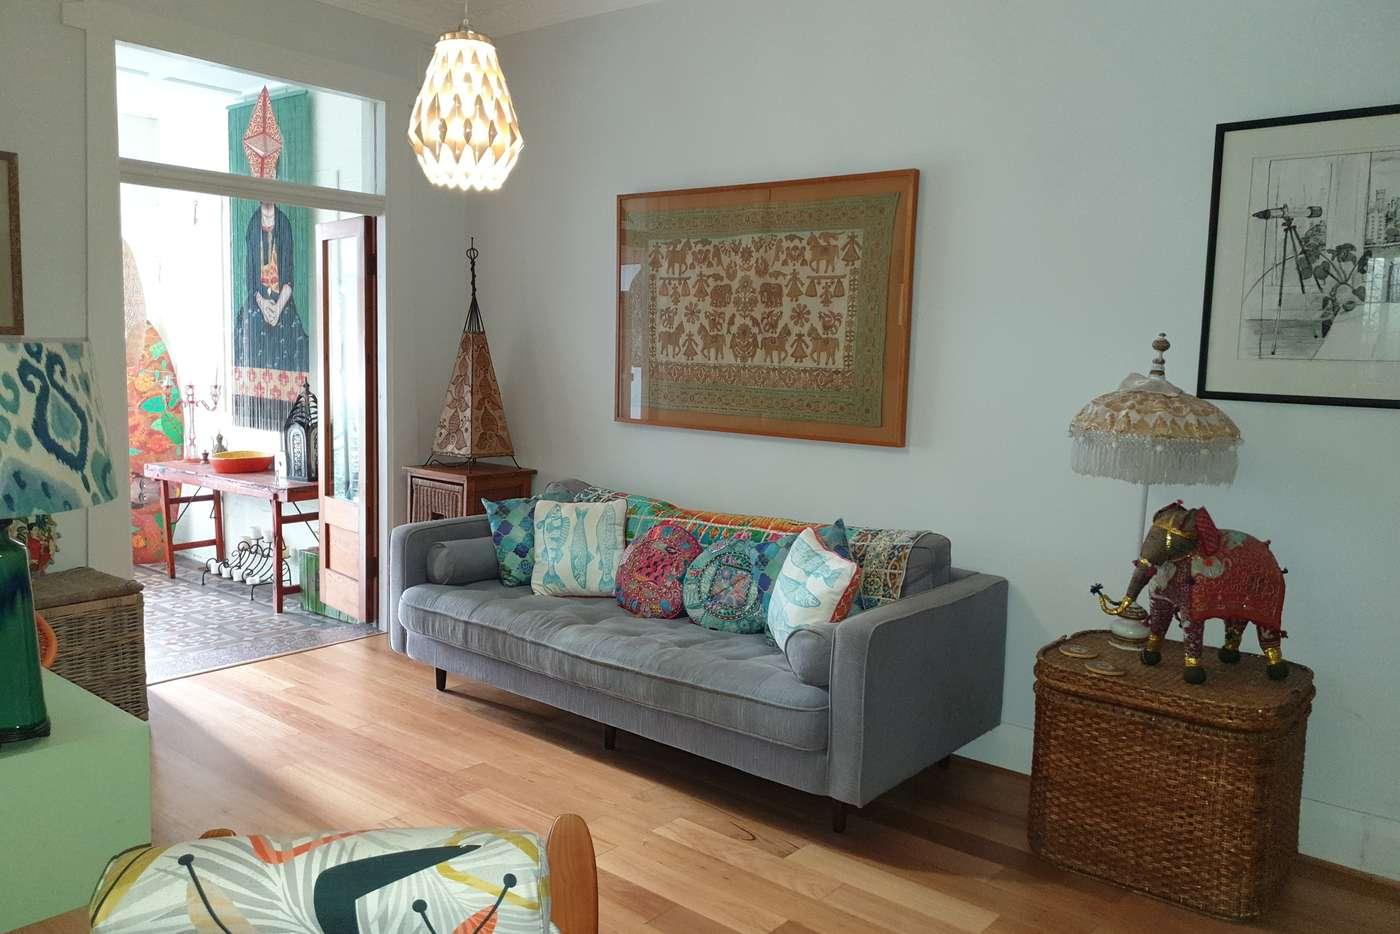 Main view of Homely apartment listing, 1/42 Lamrock Avenue, Bondi Beach NSW 2026